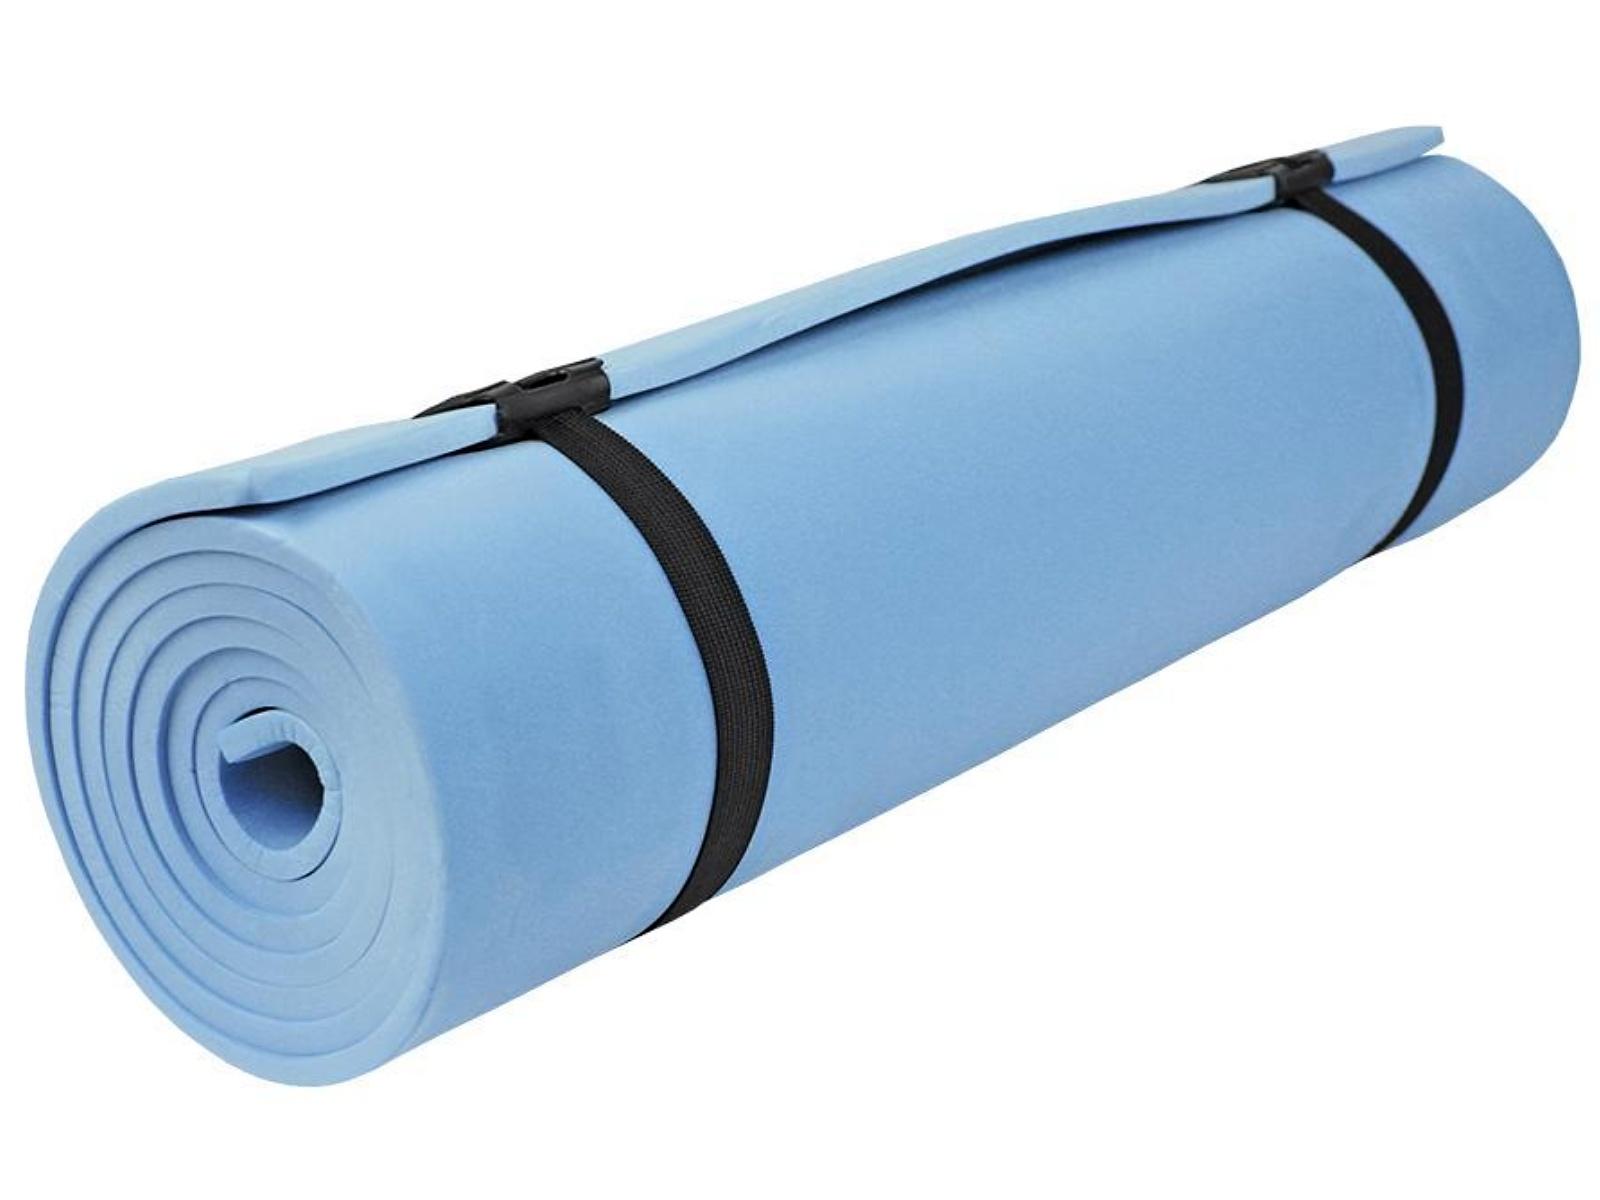 Karimatka SPOKEY Drifter modrá jednovrstvá 0,7 cm